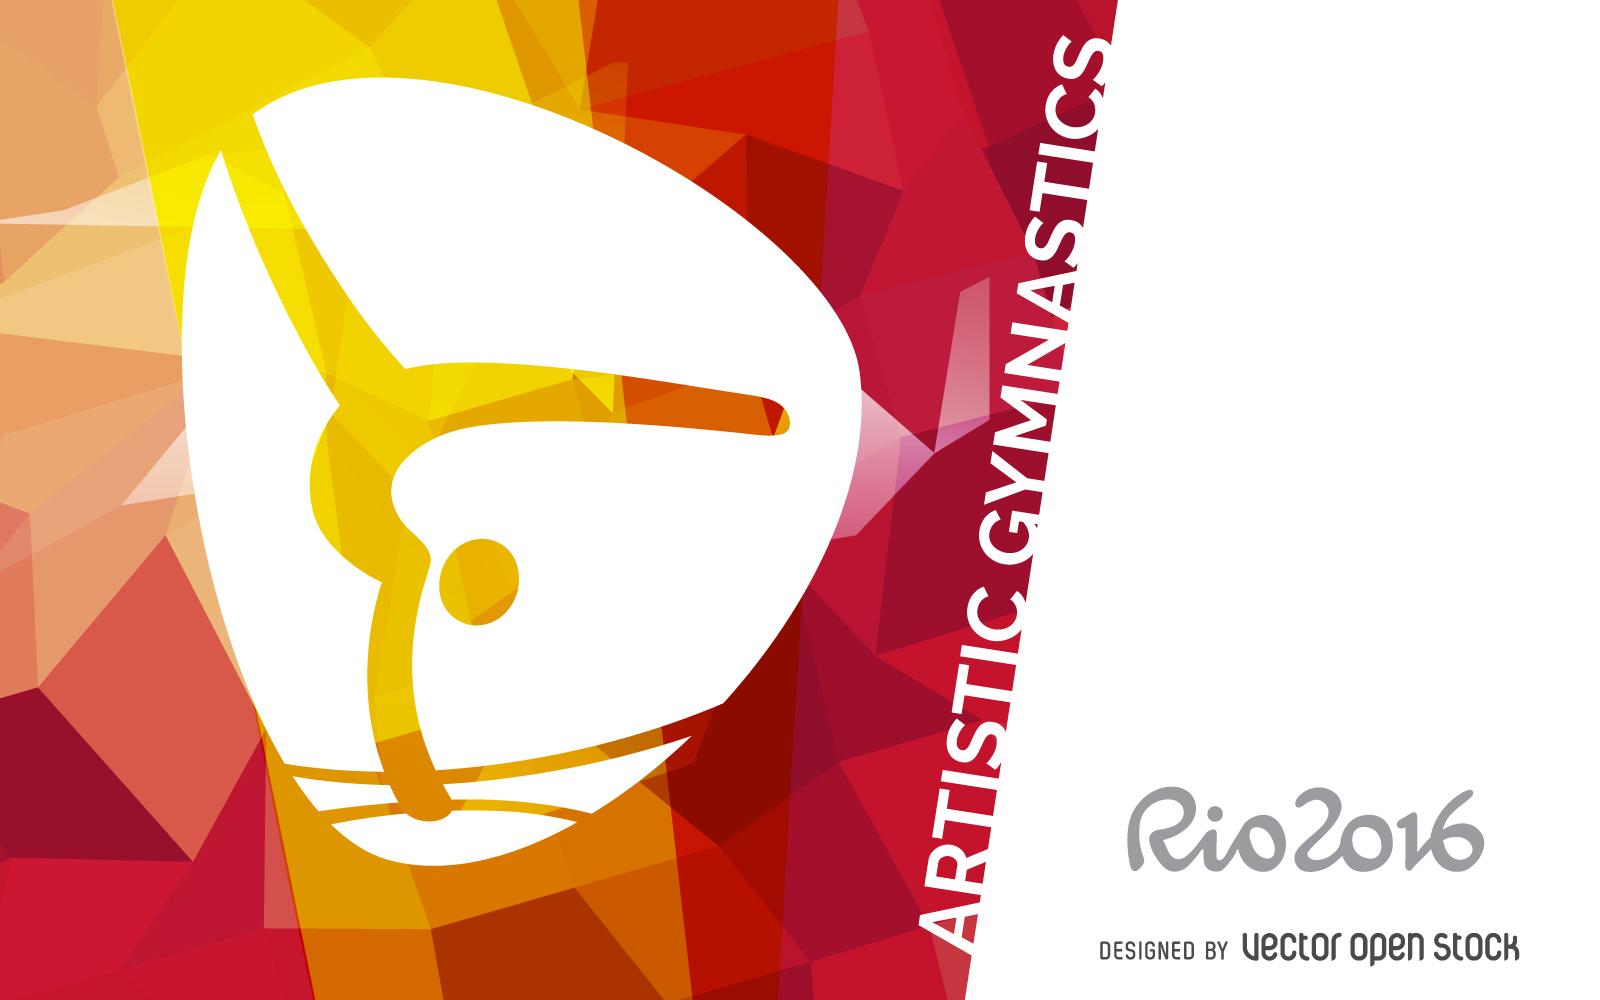 rio-2016-artistic-gymnastics-banner